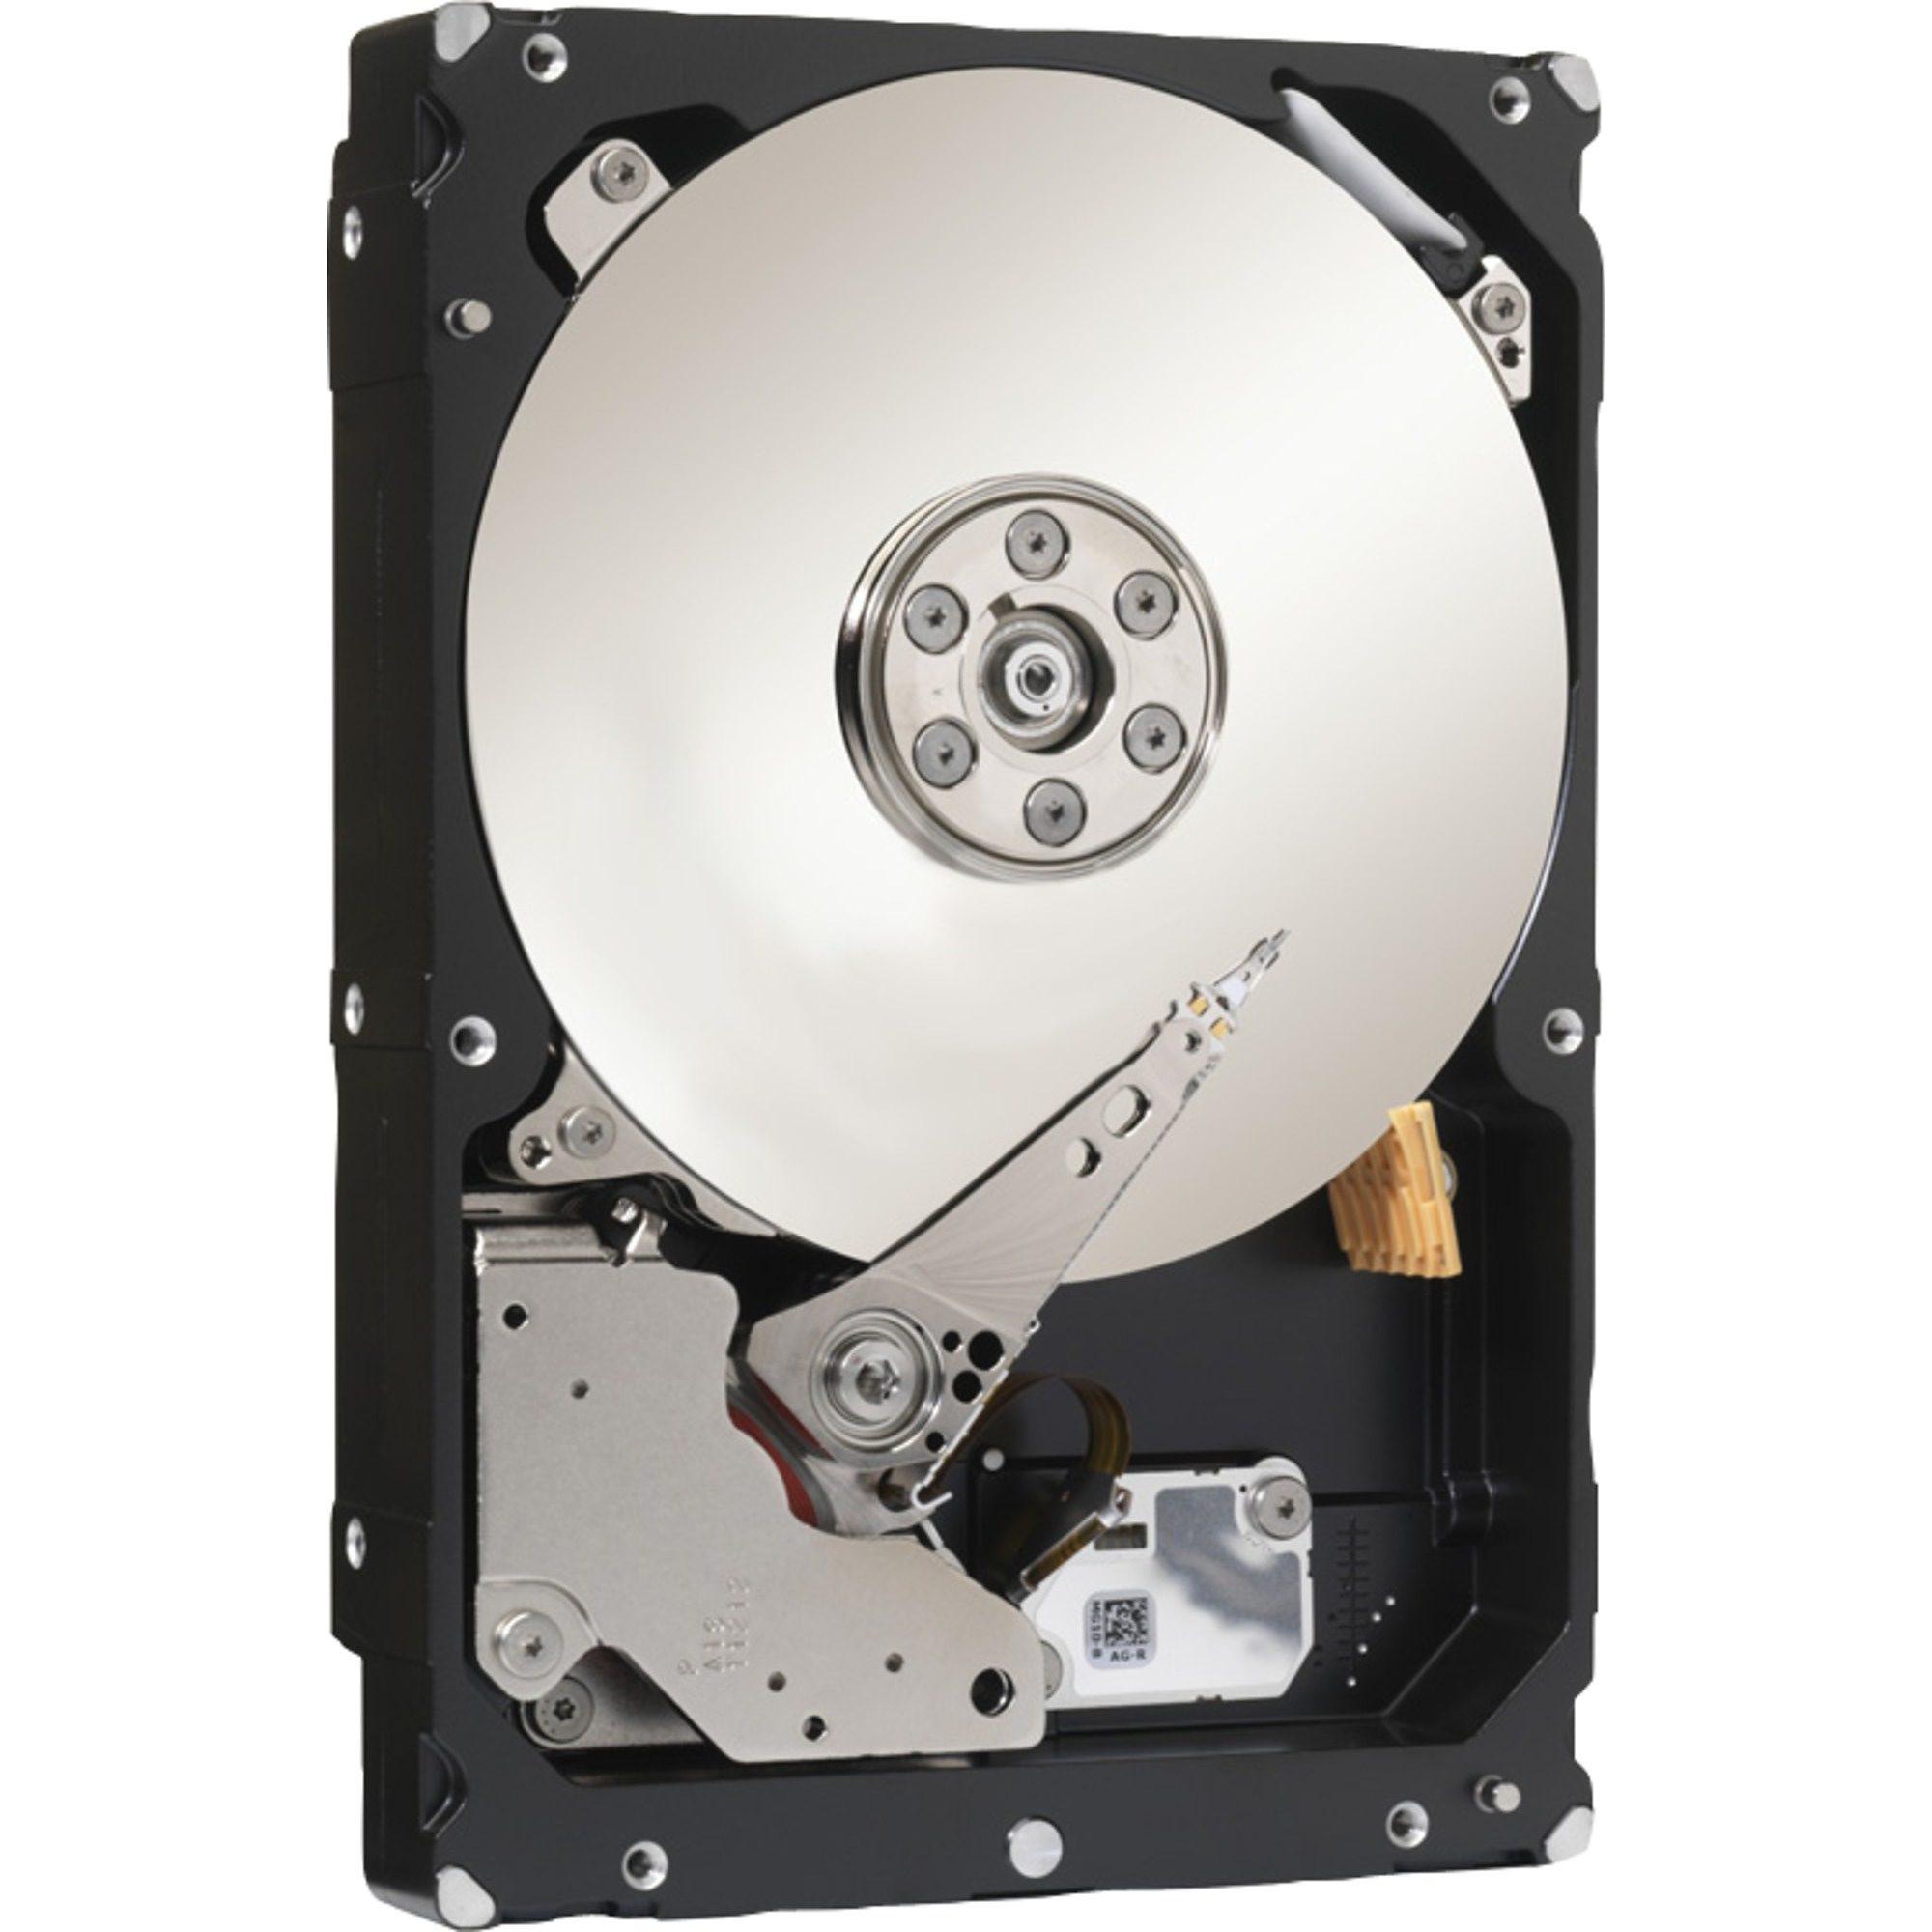 Seagate Festplatte ST2000NM0033 2 TB